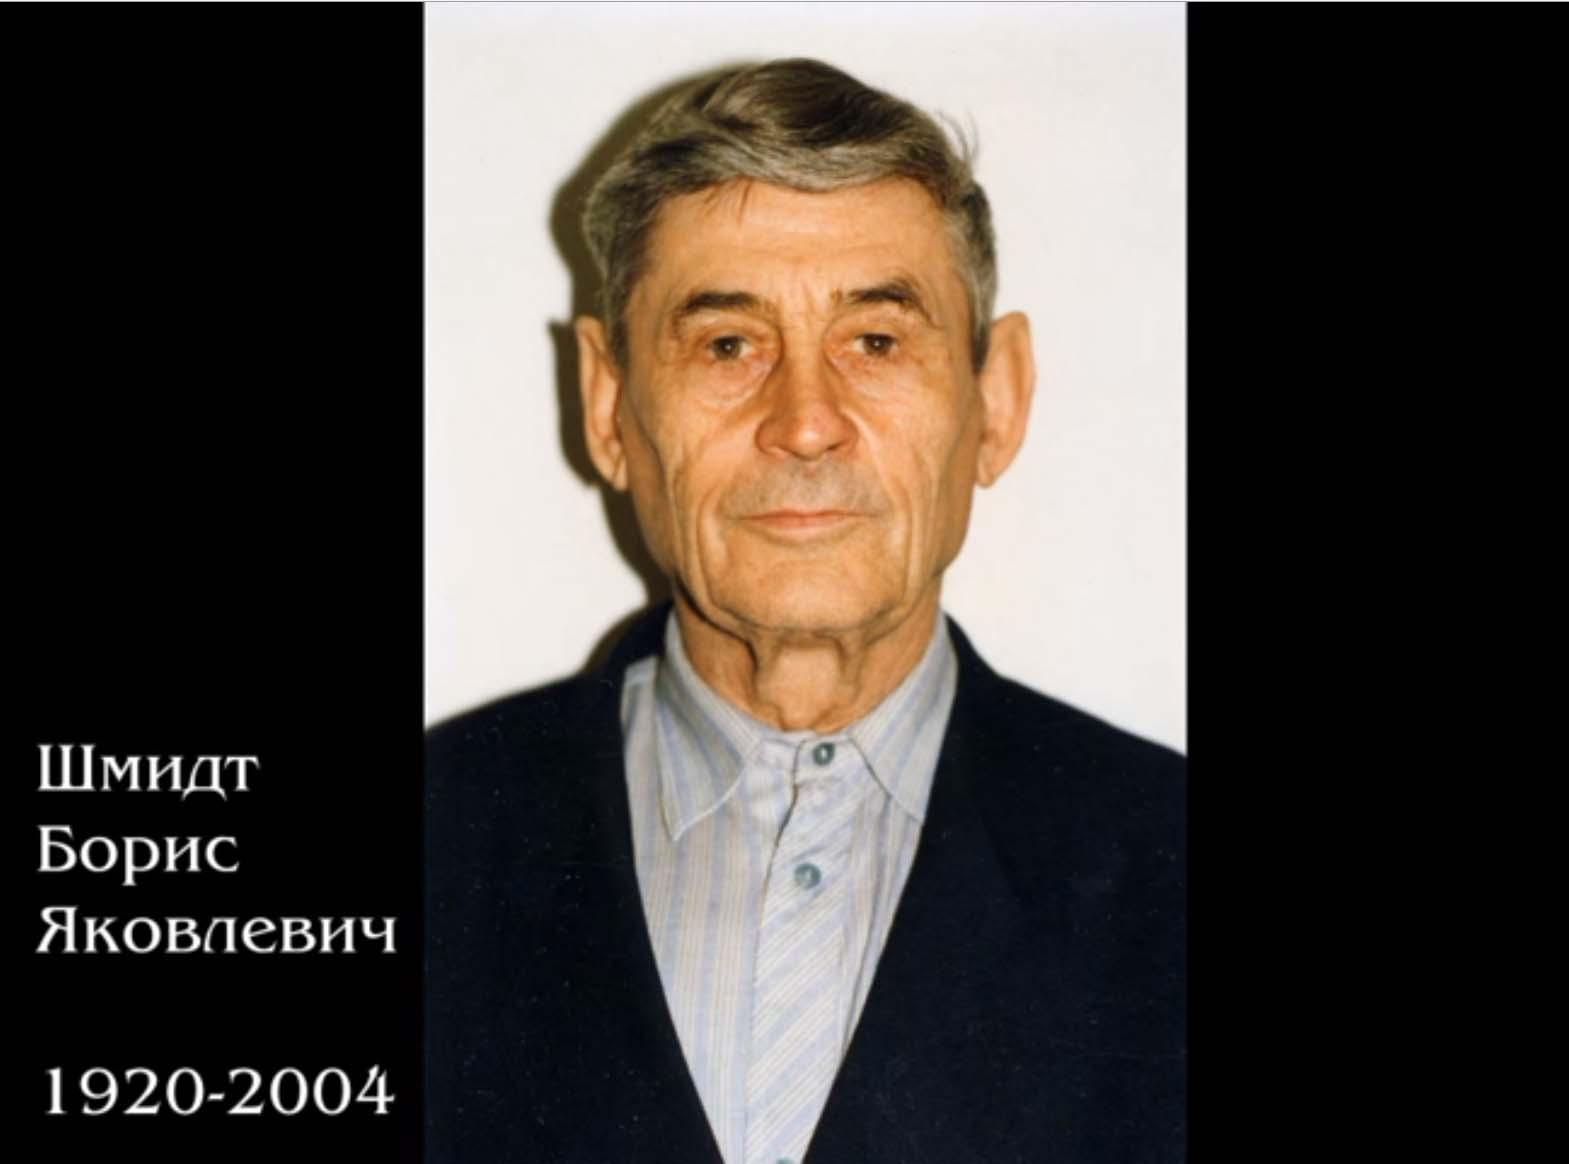 Шмидт Борис Яковлевич 1920-2004